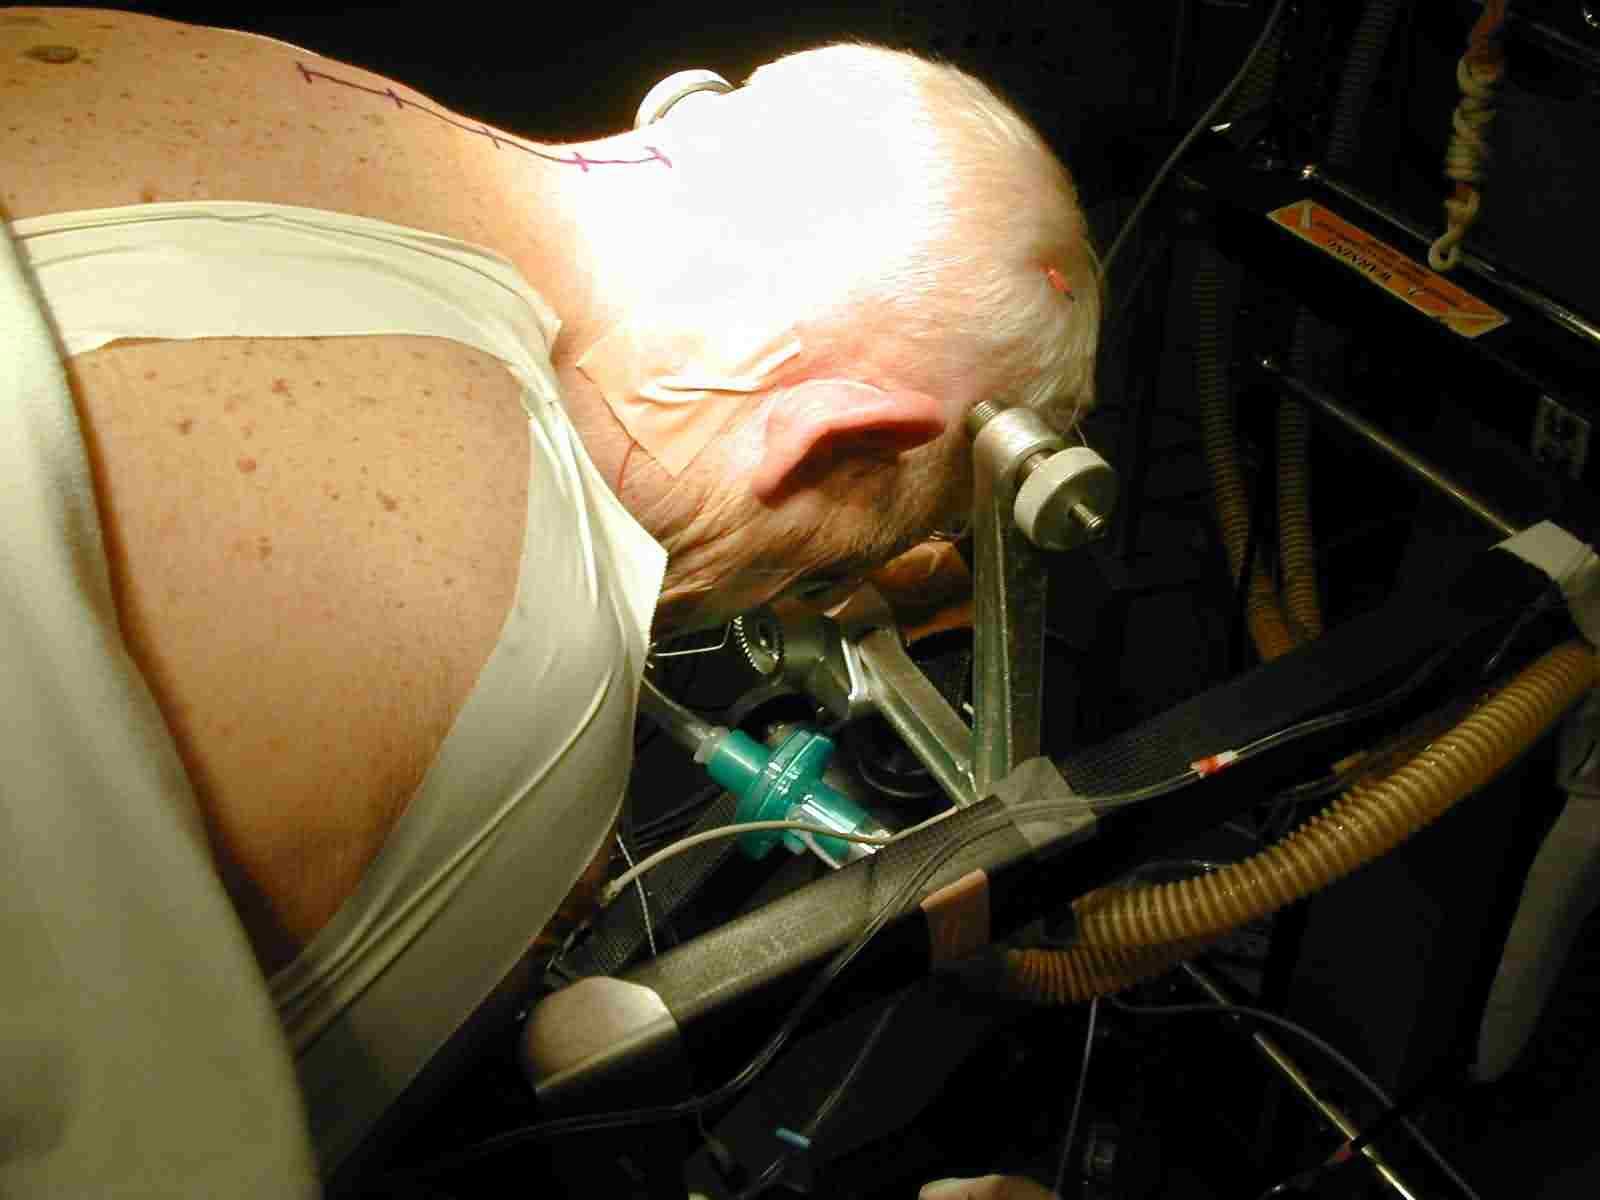 Jackson cervical lami positioning